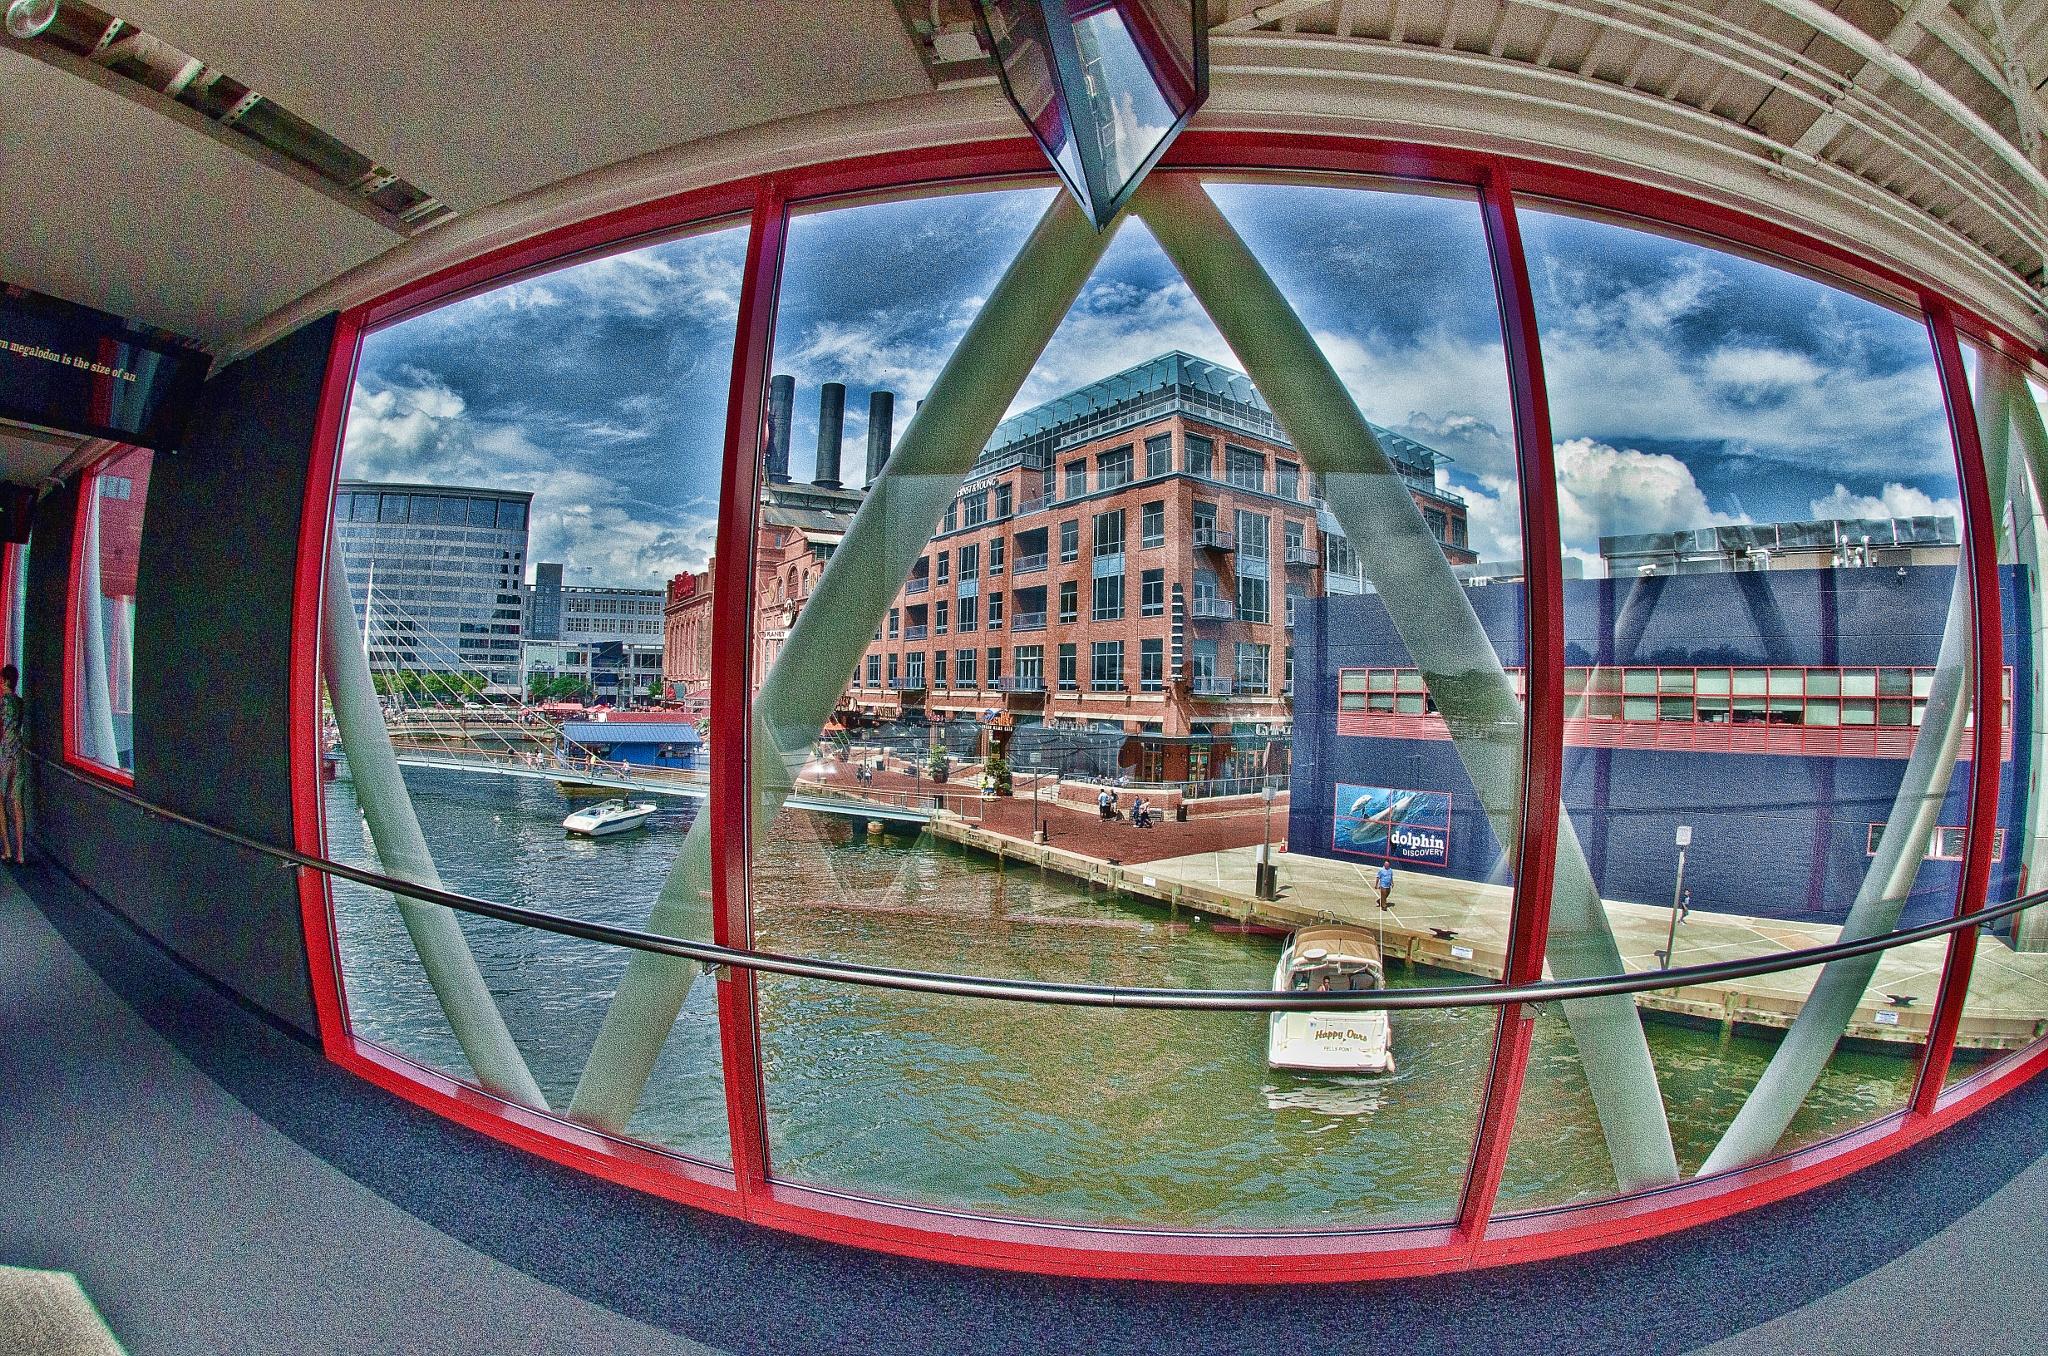 Baltimore Aquarium IV by JohnEllingson